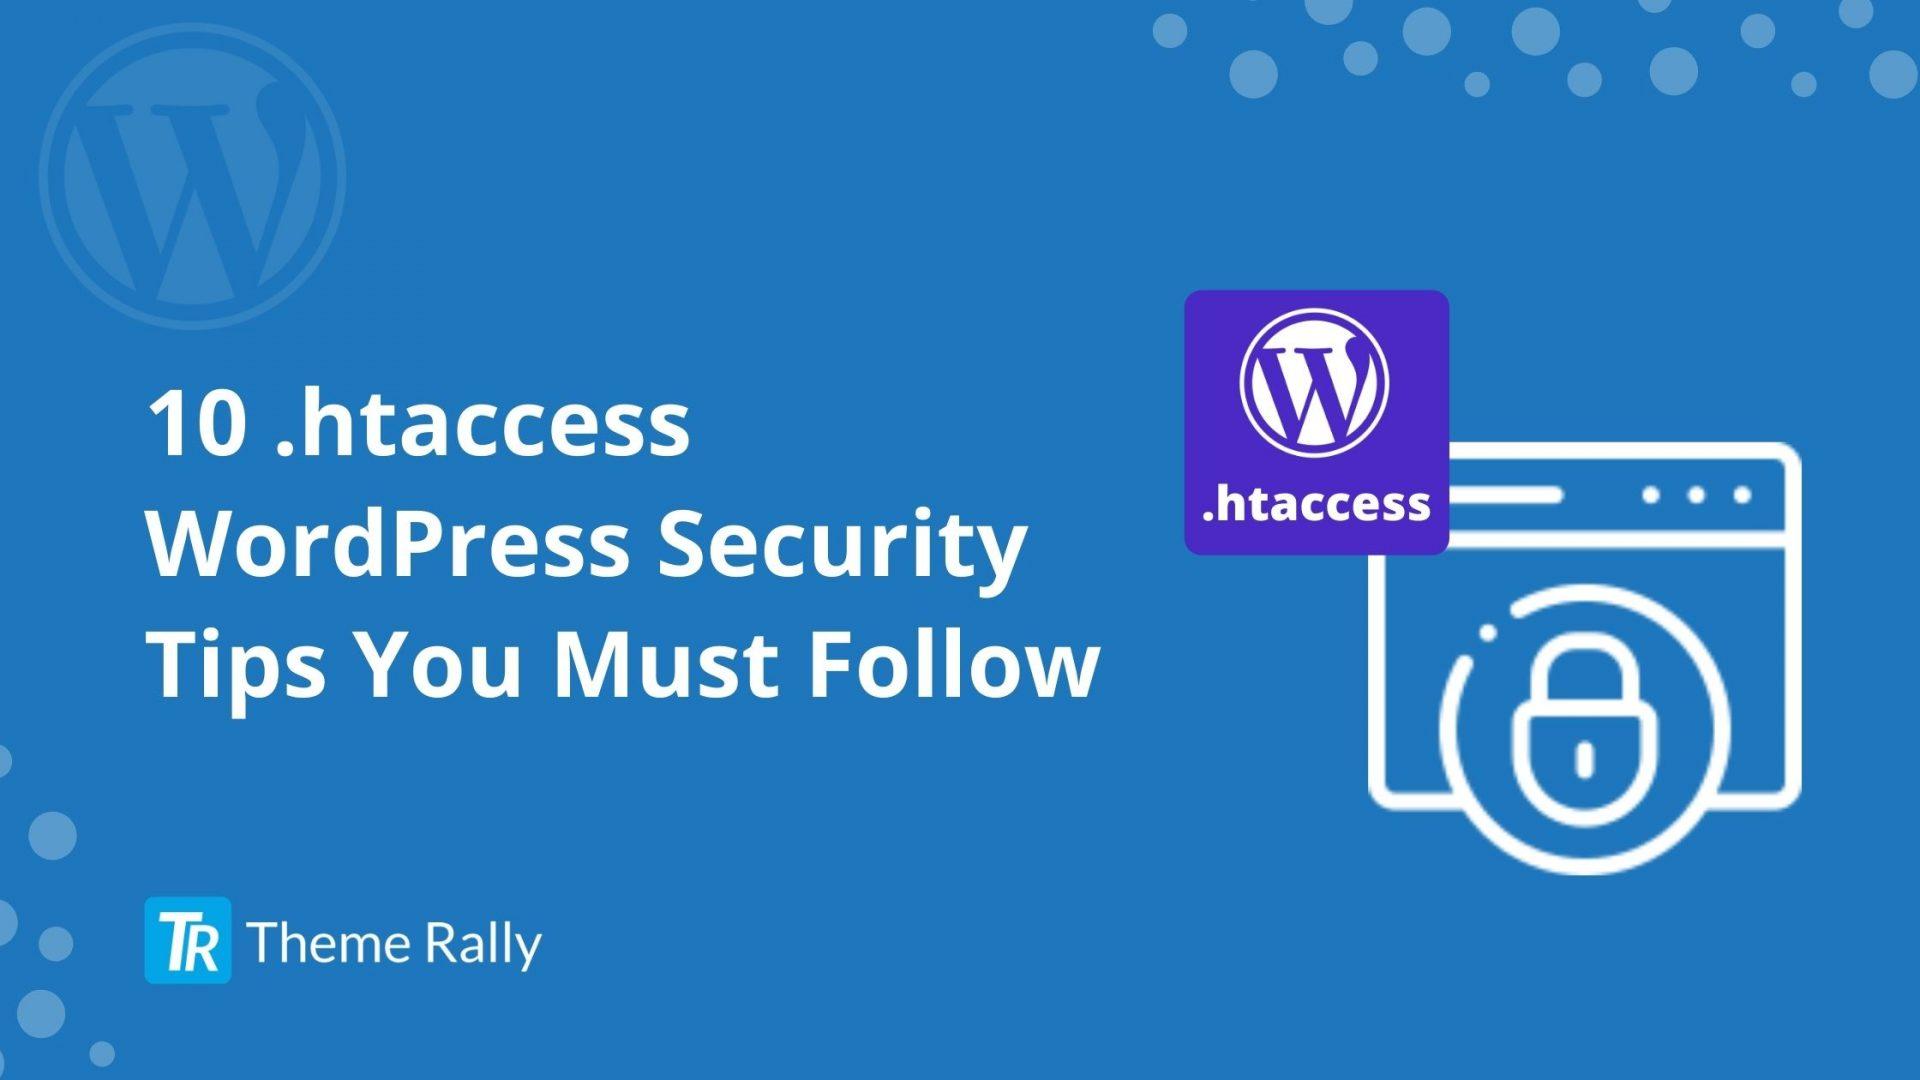 10 .htaccess WordPress Security Tips You Must Follow